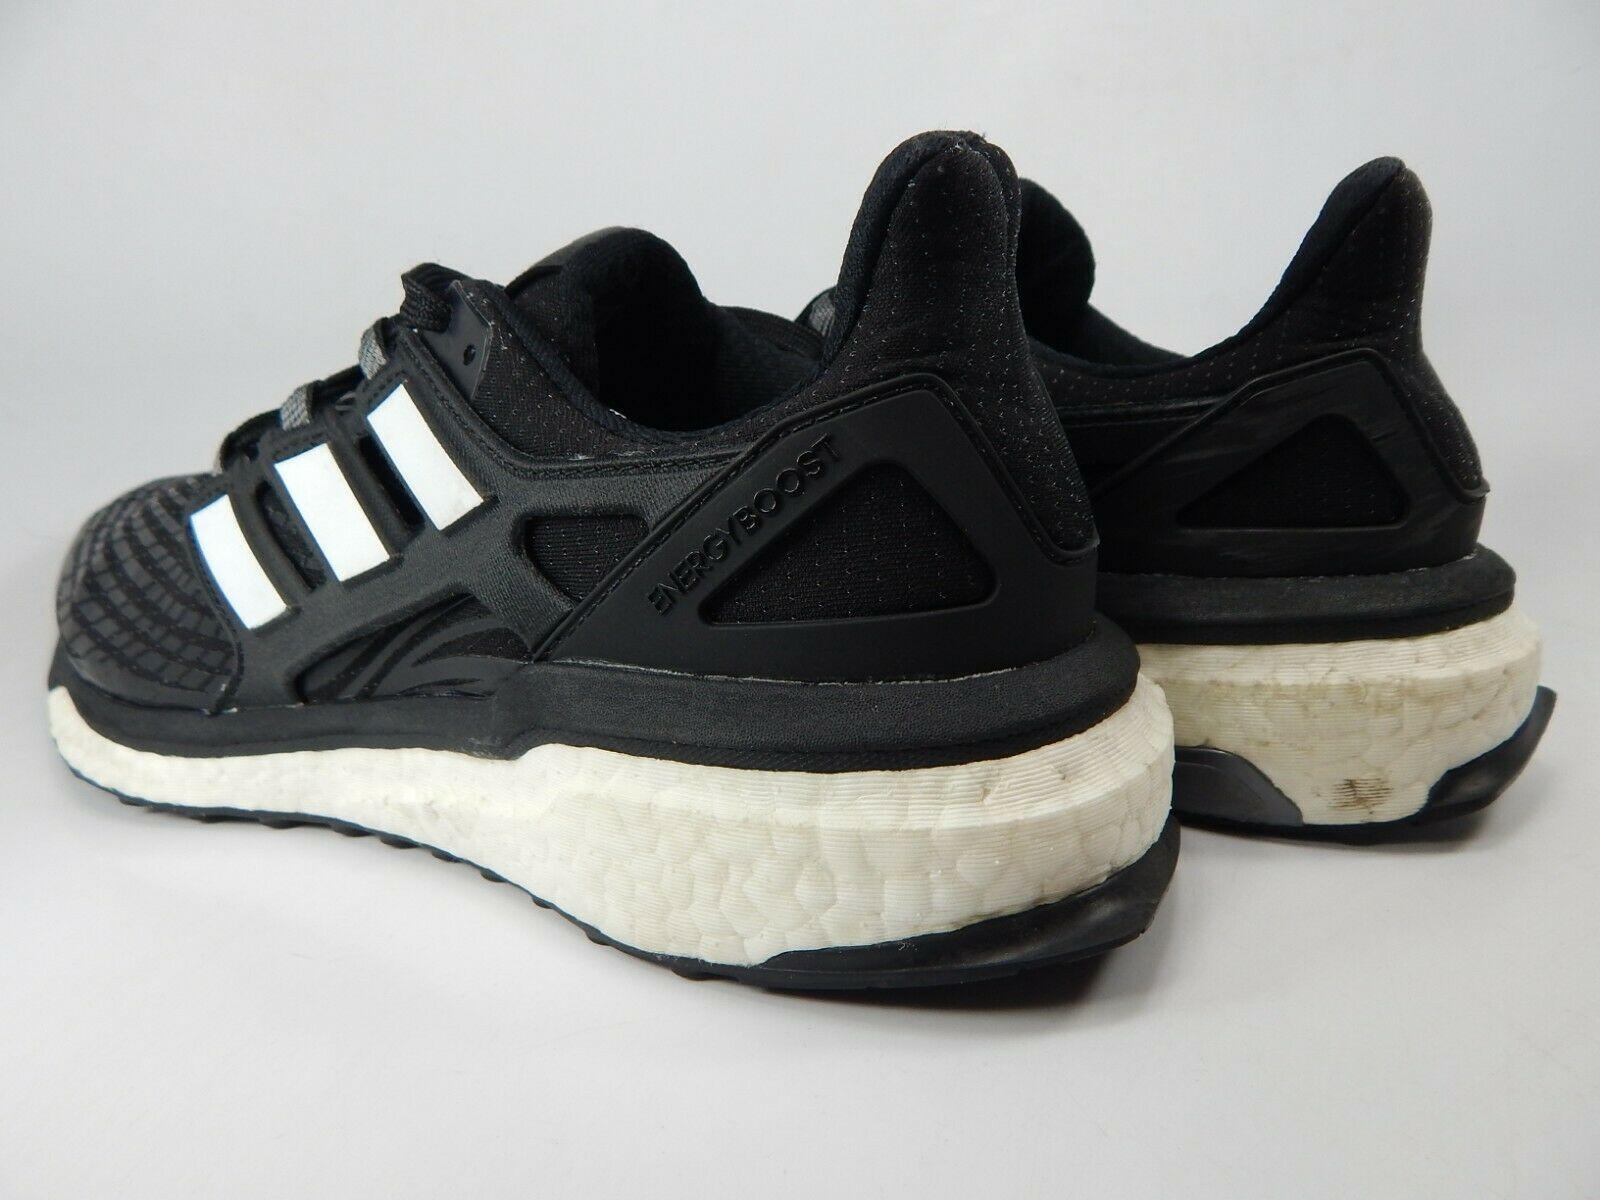 Adidas Energy Boost Misura USA 9.5 M (D) Eu 43 1/3 Uomo Scarpe da Corsa Nero image 4